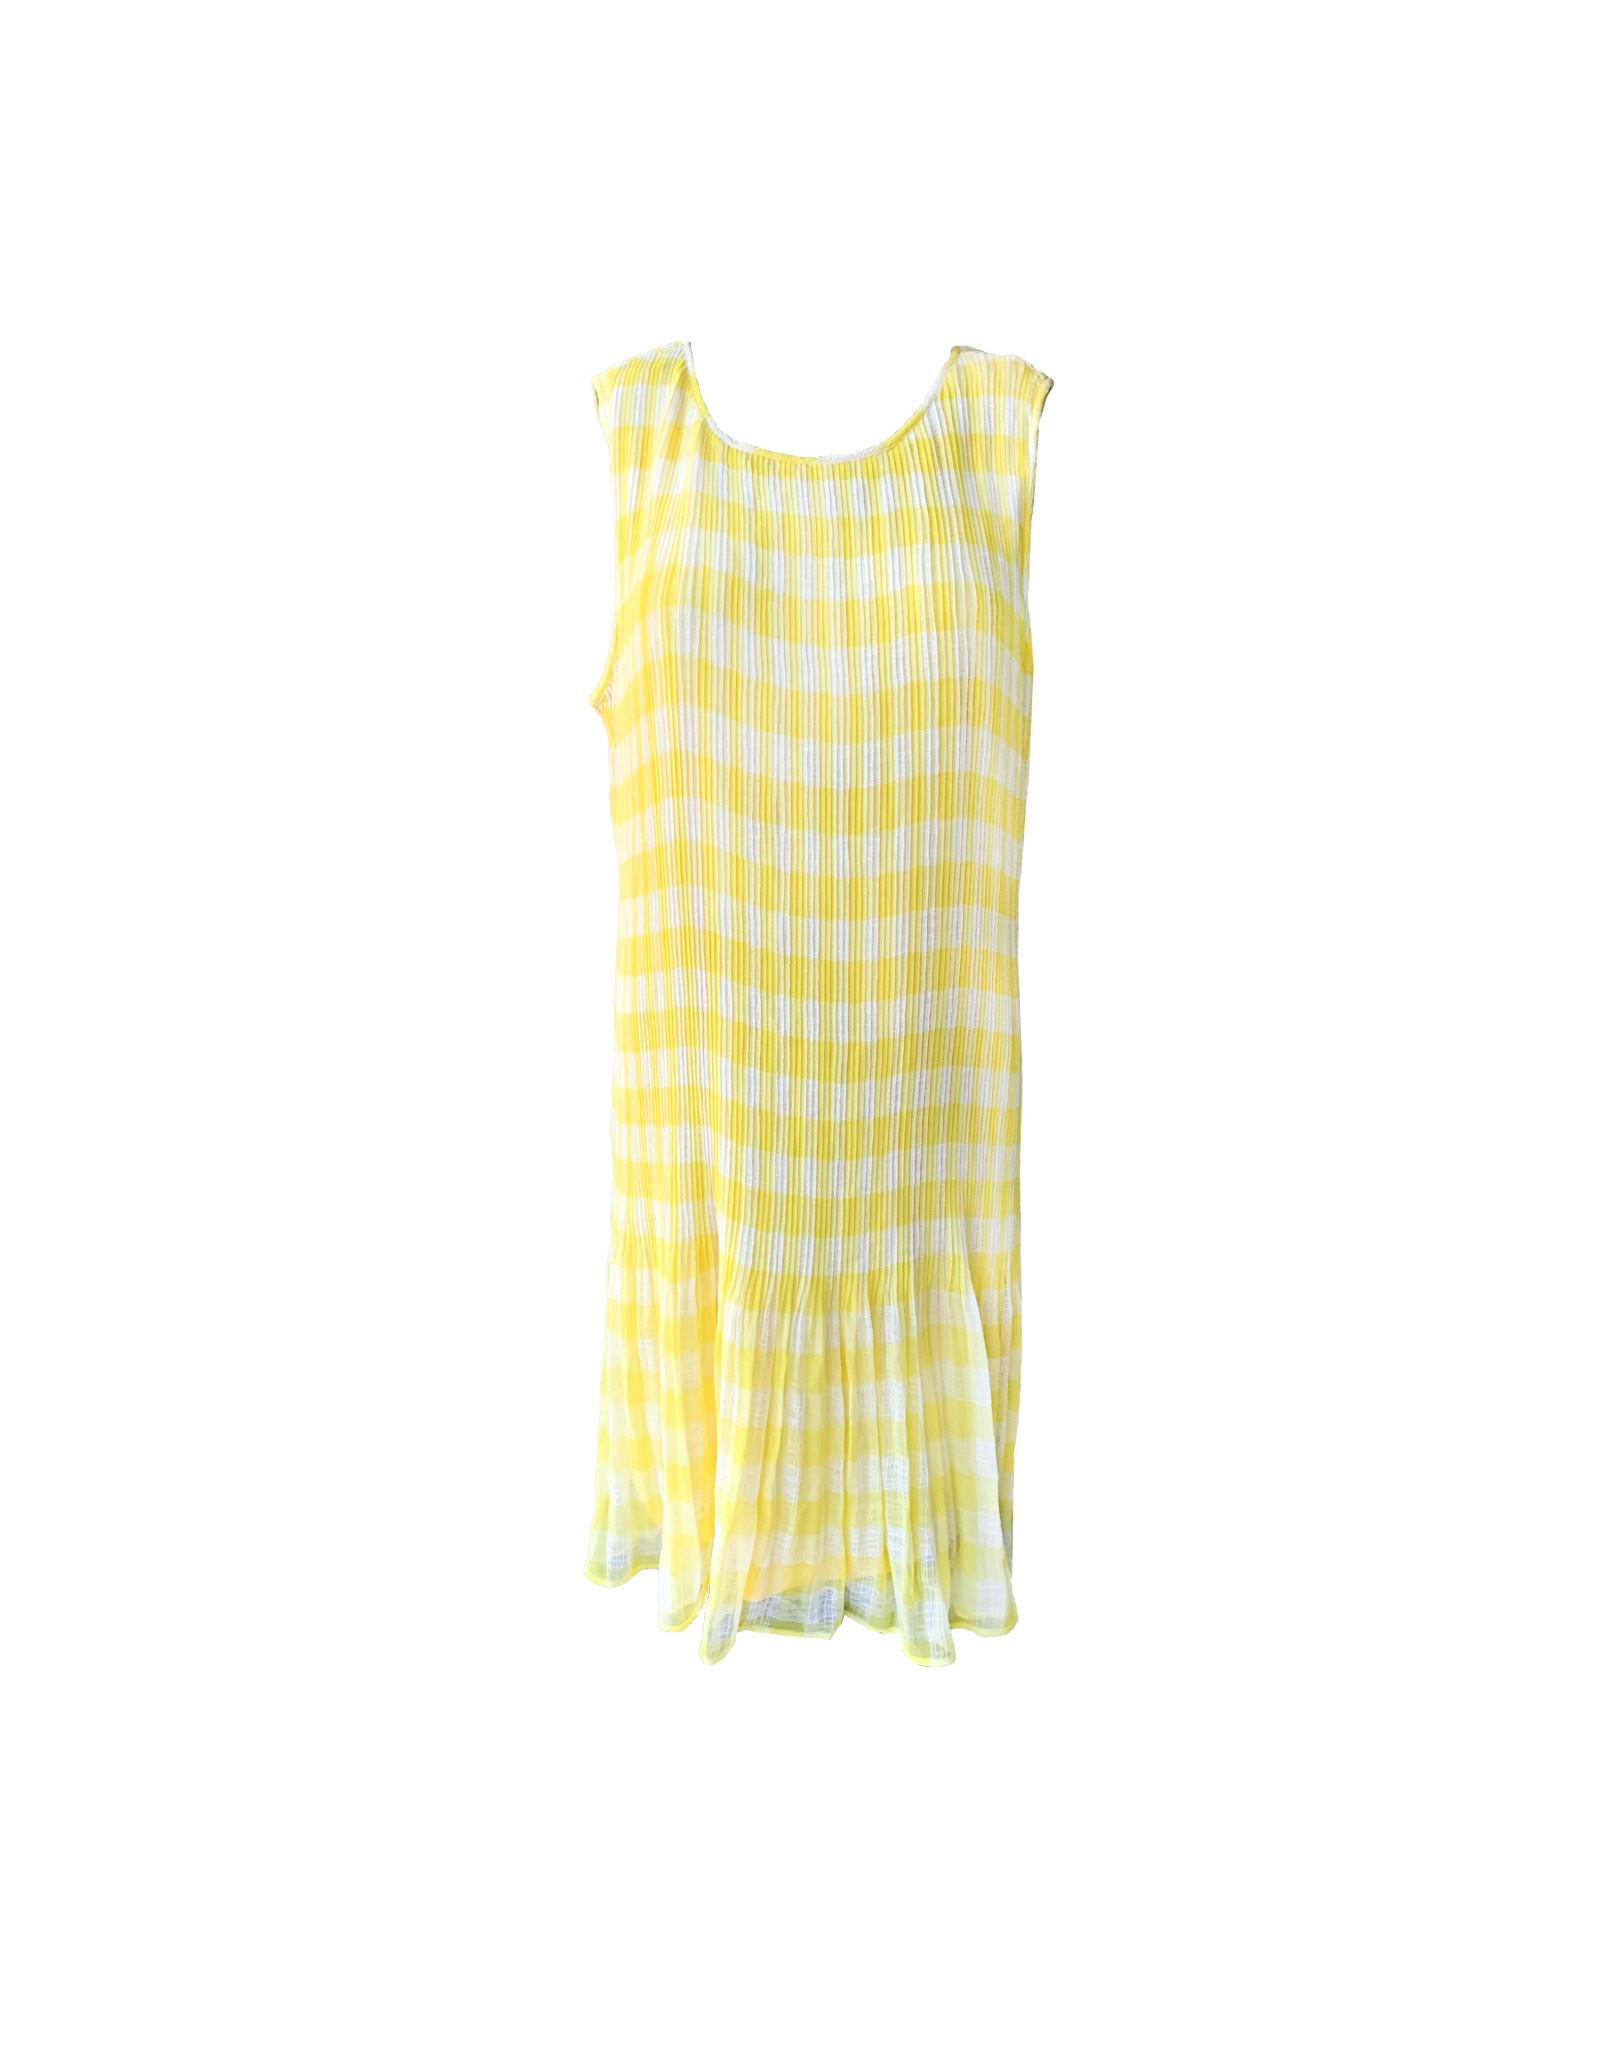 DKNY DKNY  Summer Dress size 14